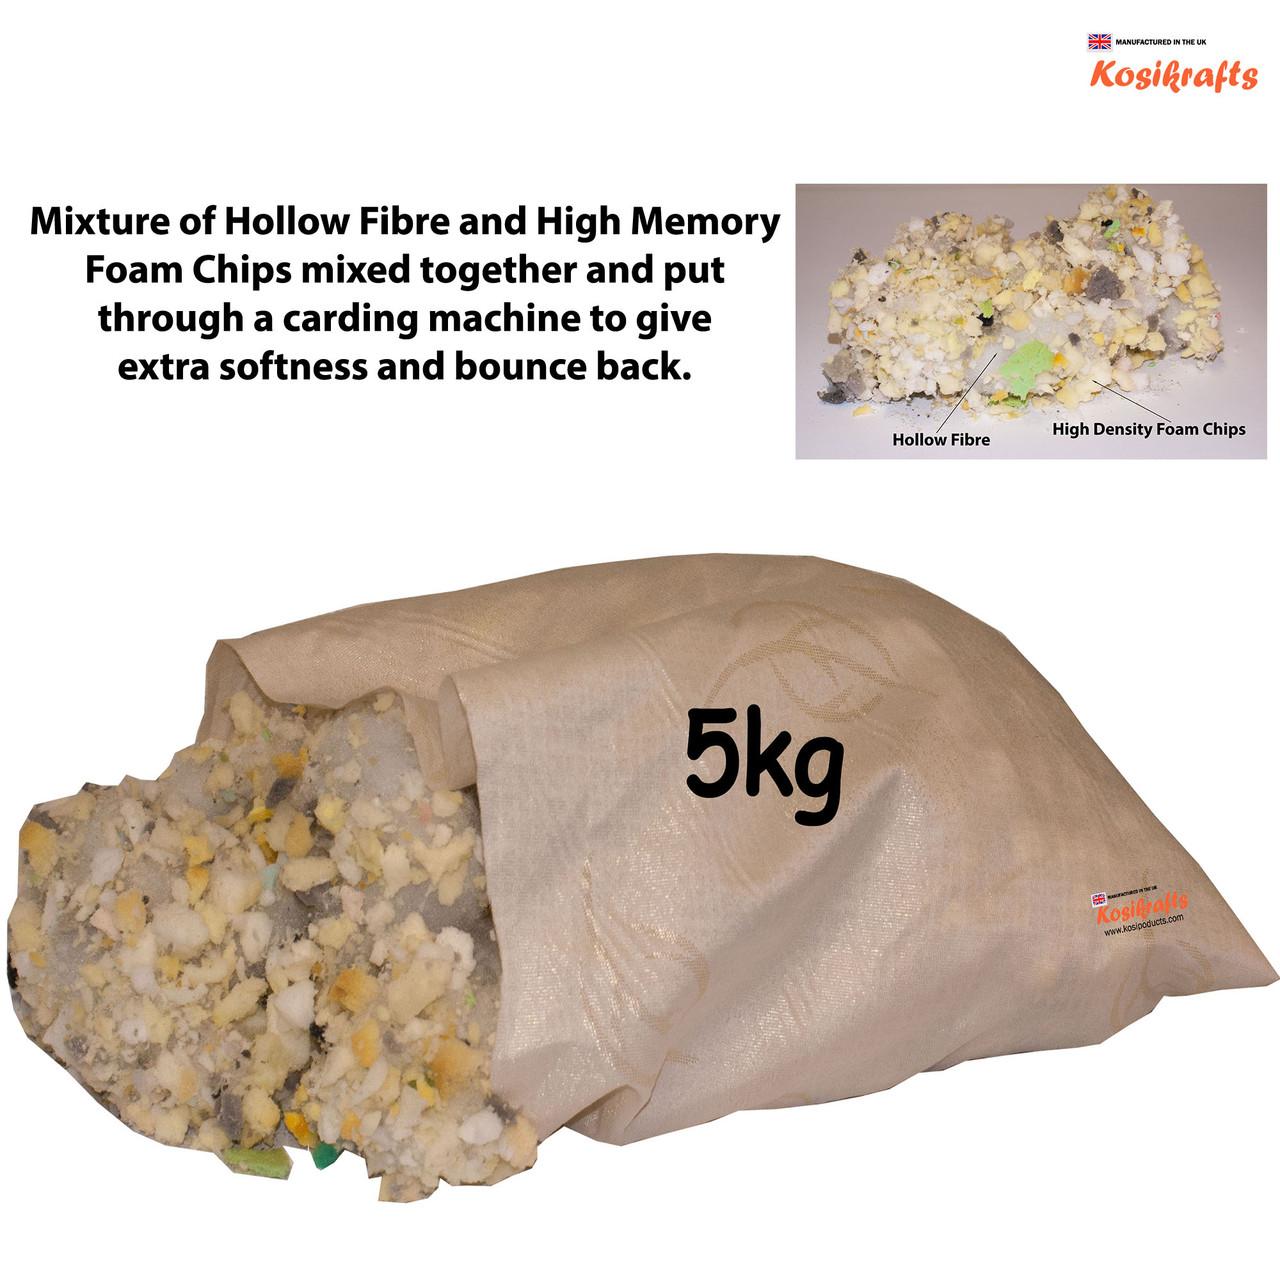 kosikrafts 5kg hollow fibre + Memory Foam mix cushion toy stuffing filling